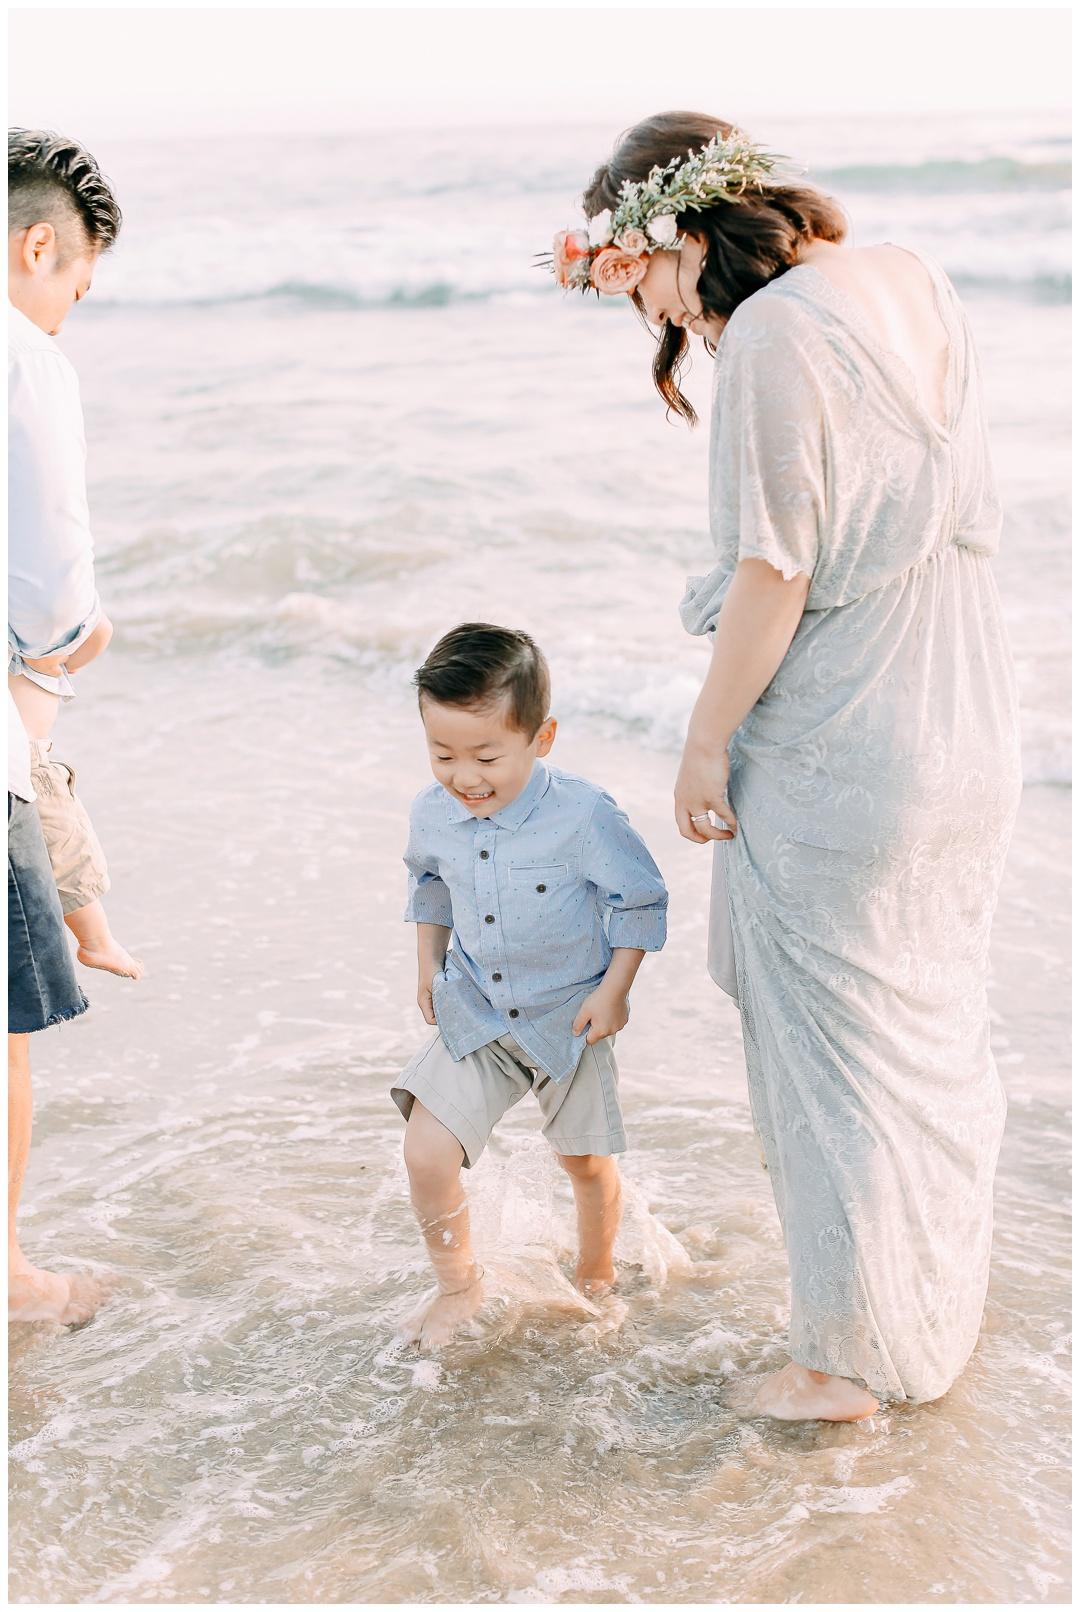 Newport_Beach_Maternity_Photographer_Orange_County_Maternity_Photography_Cori_Kleckner_Photography_Orange_County_Family_Photographer_Beach_Maternity_Session_1104.jpg